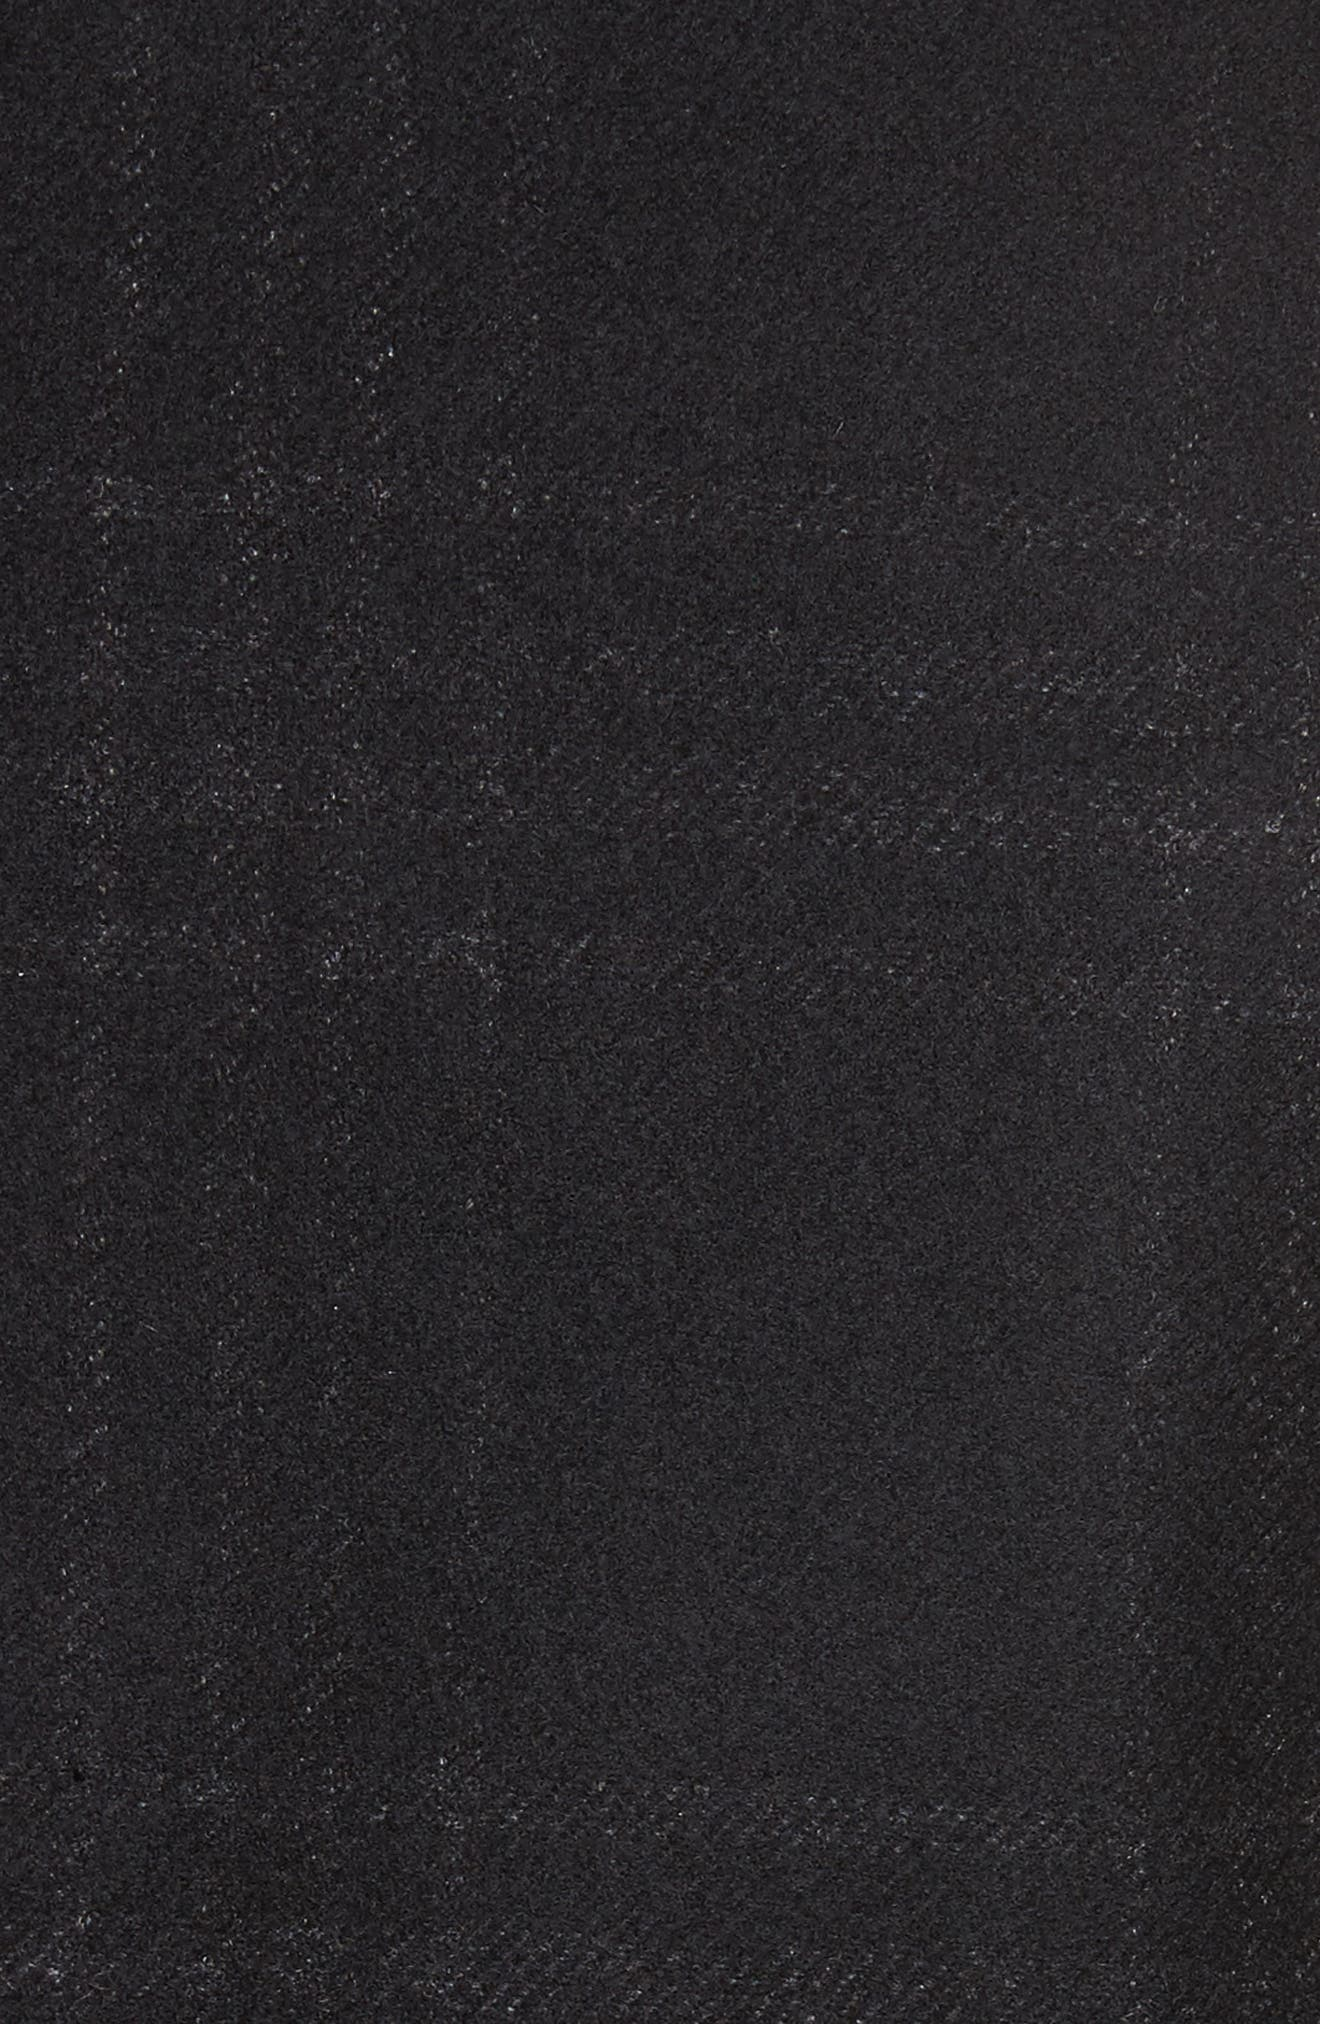 Hook Plaid Wool Blend Topcoat,                             Alternate thumbnail 5, color,                             001